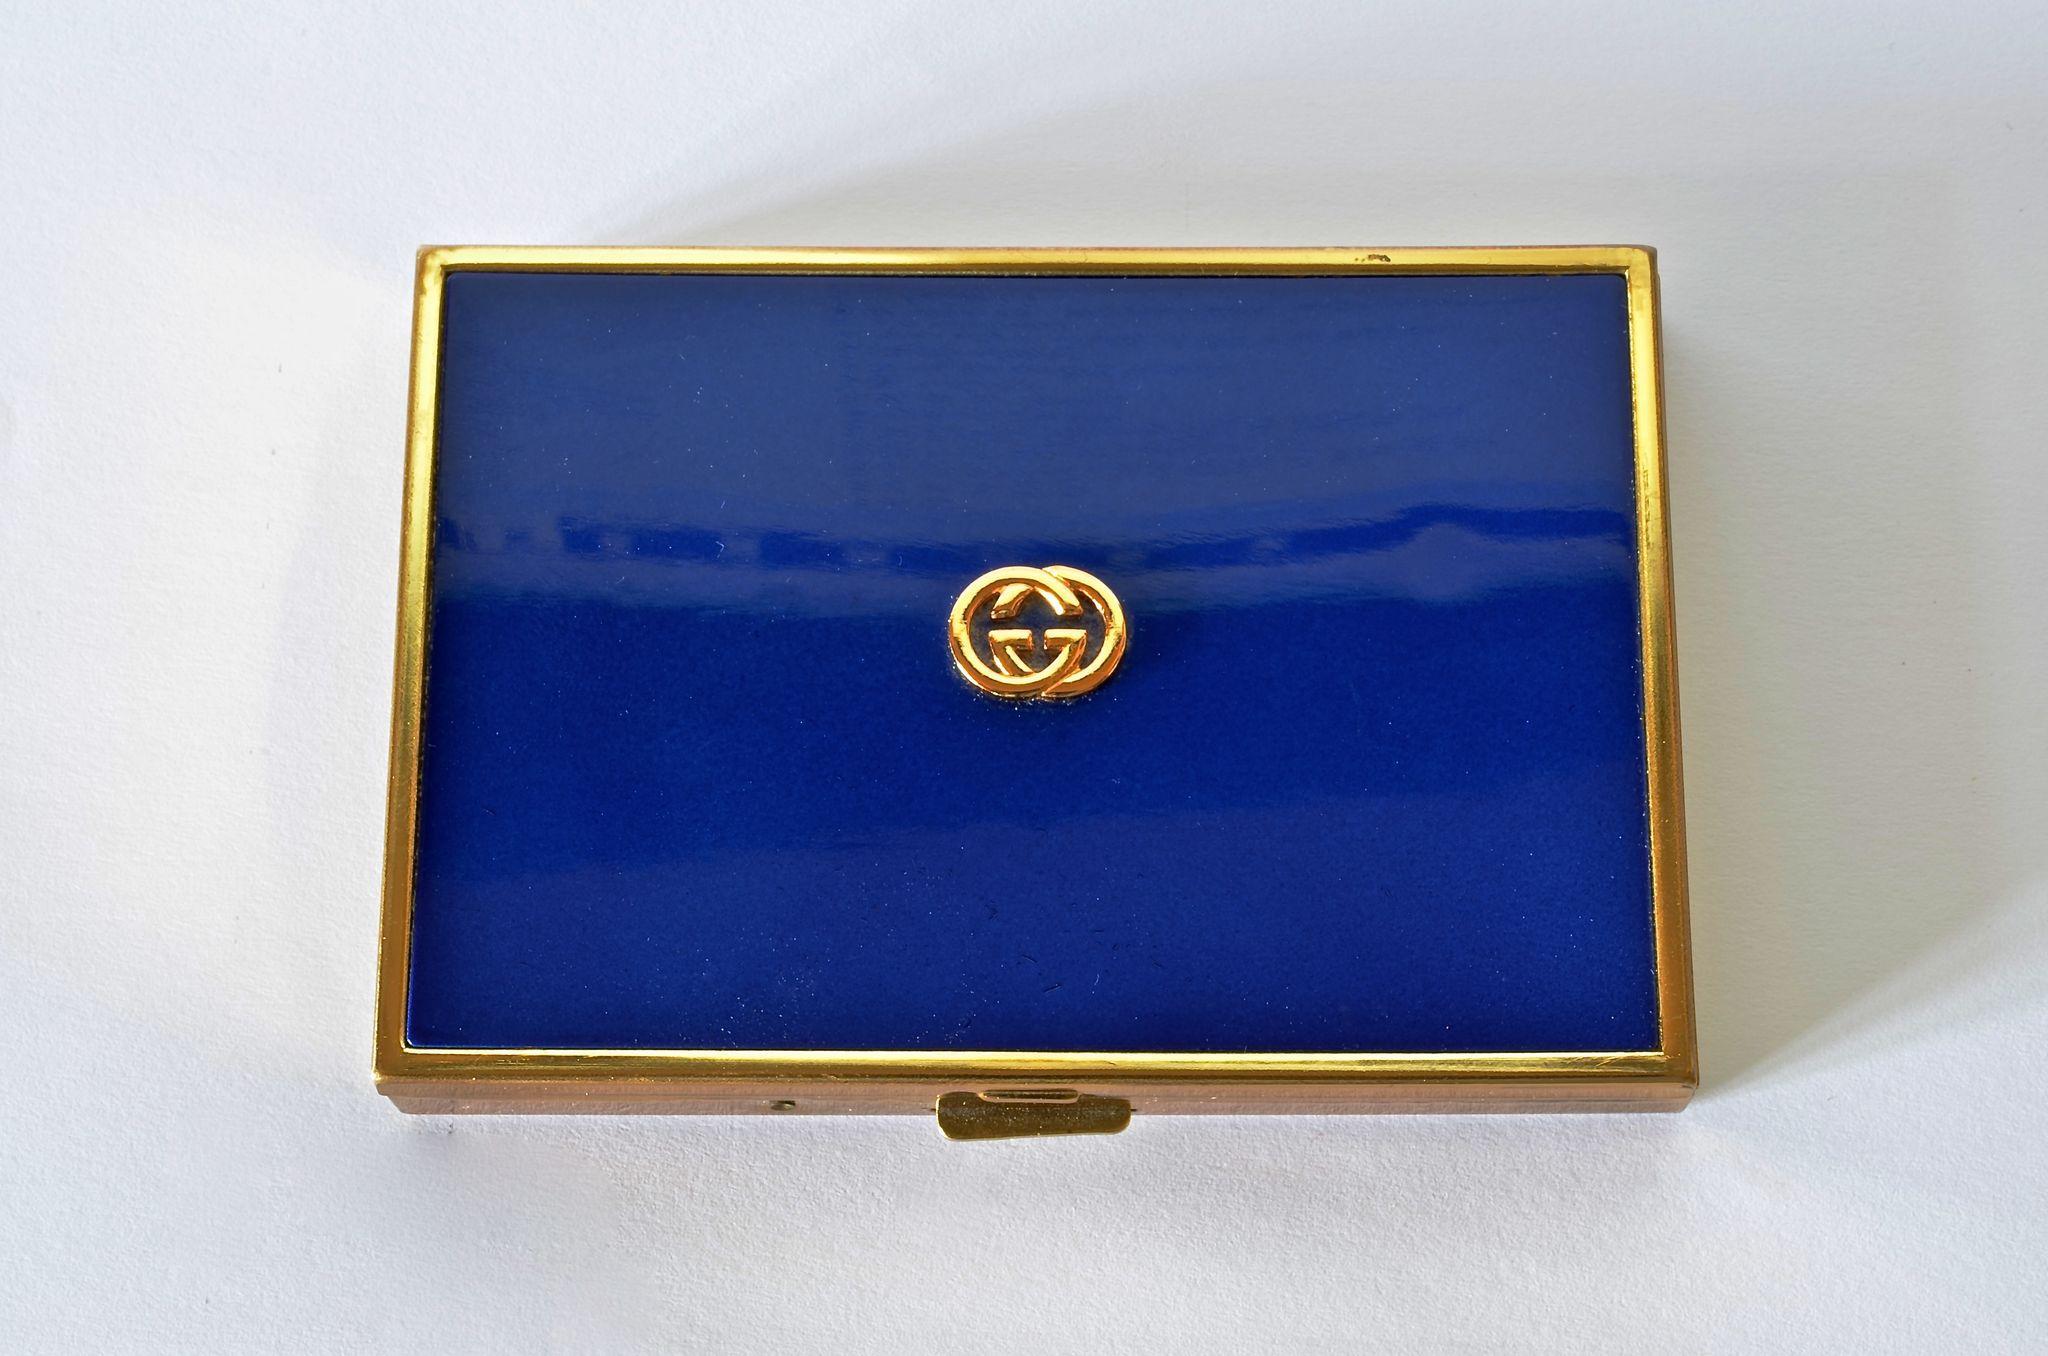 https://cdn0.rubylane.com/shops/1283531/CAx20438.2L.jpg?60